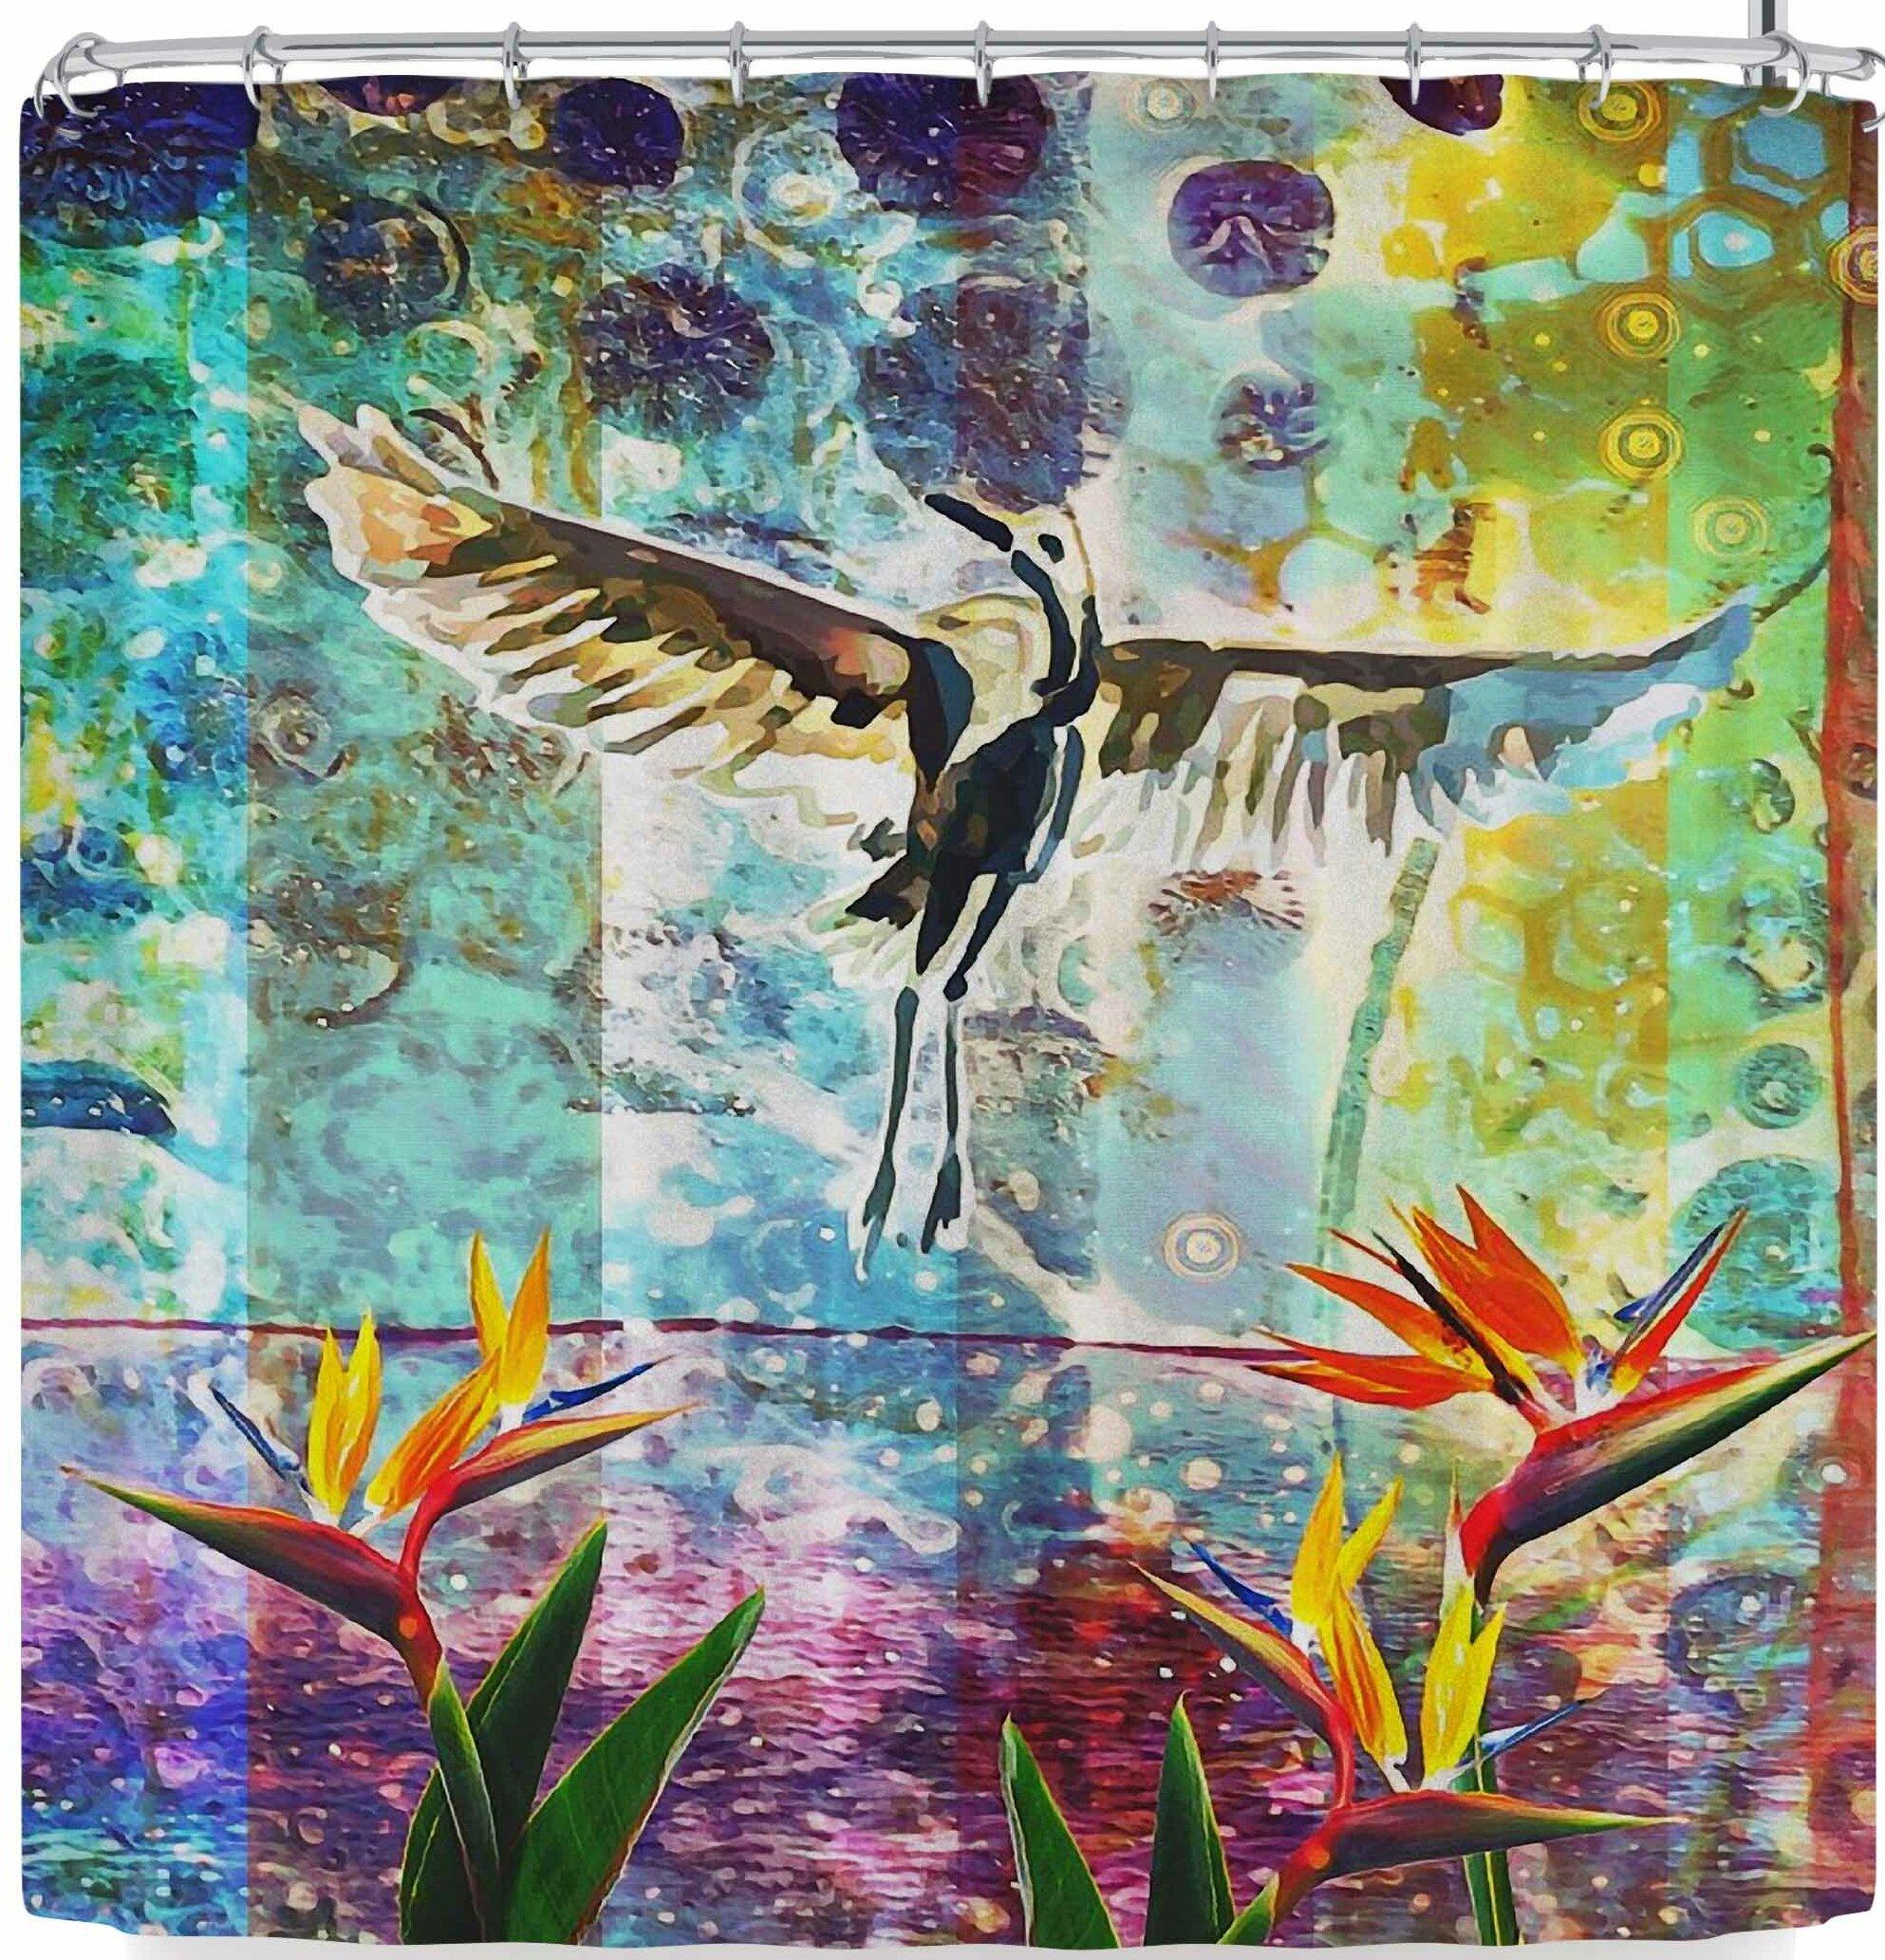 East Urban Home Alyzen Moonshadow Birds Of Paradise With Stork Shower Curtain